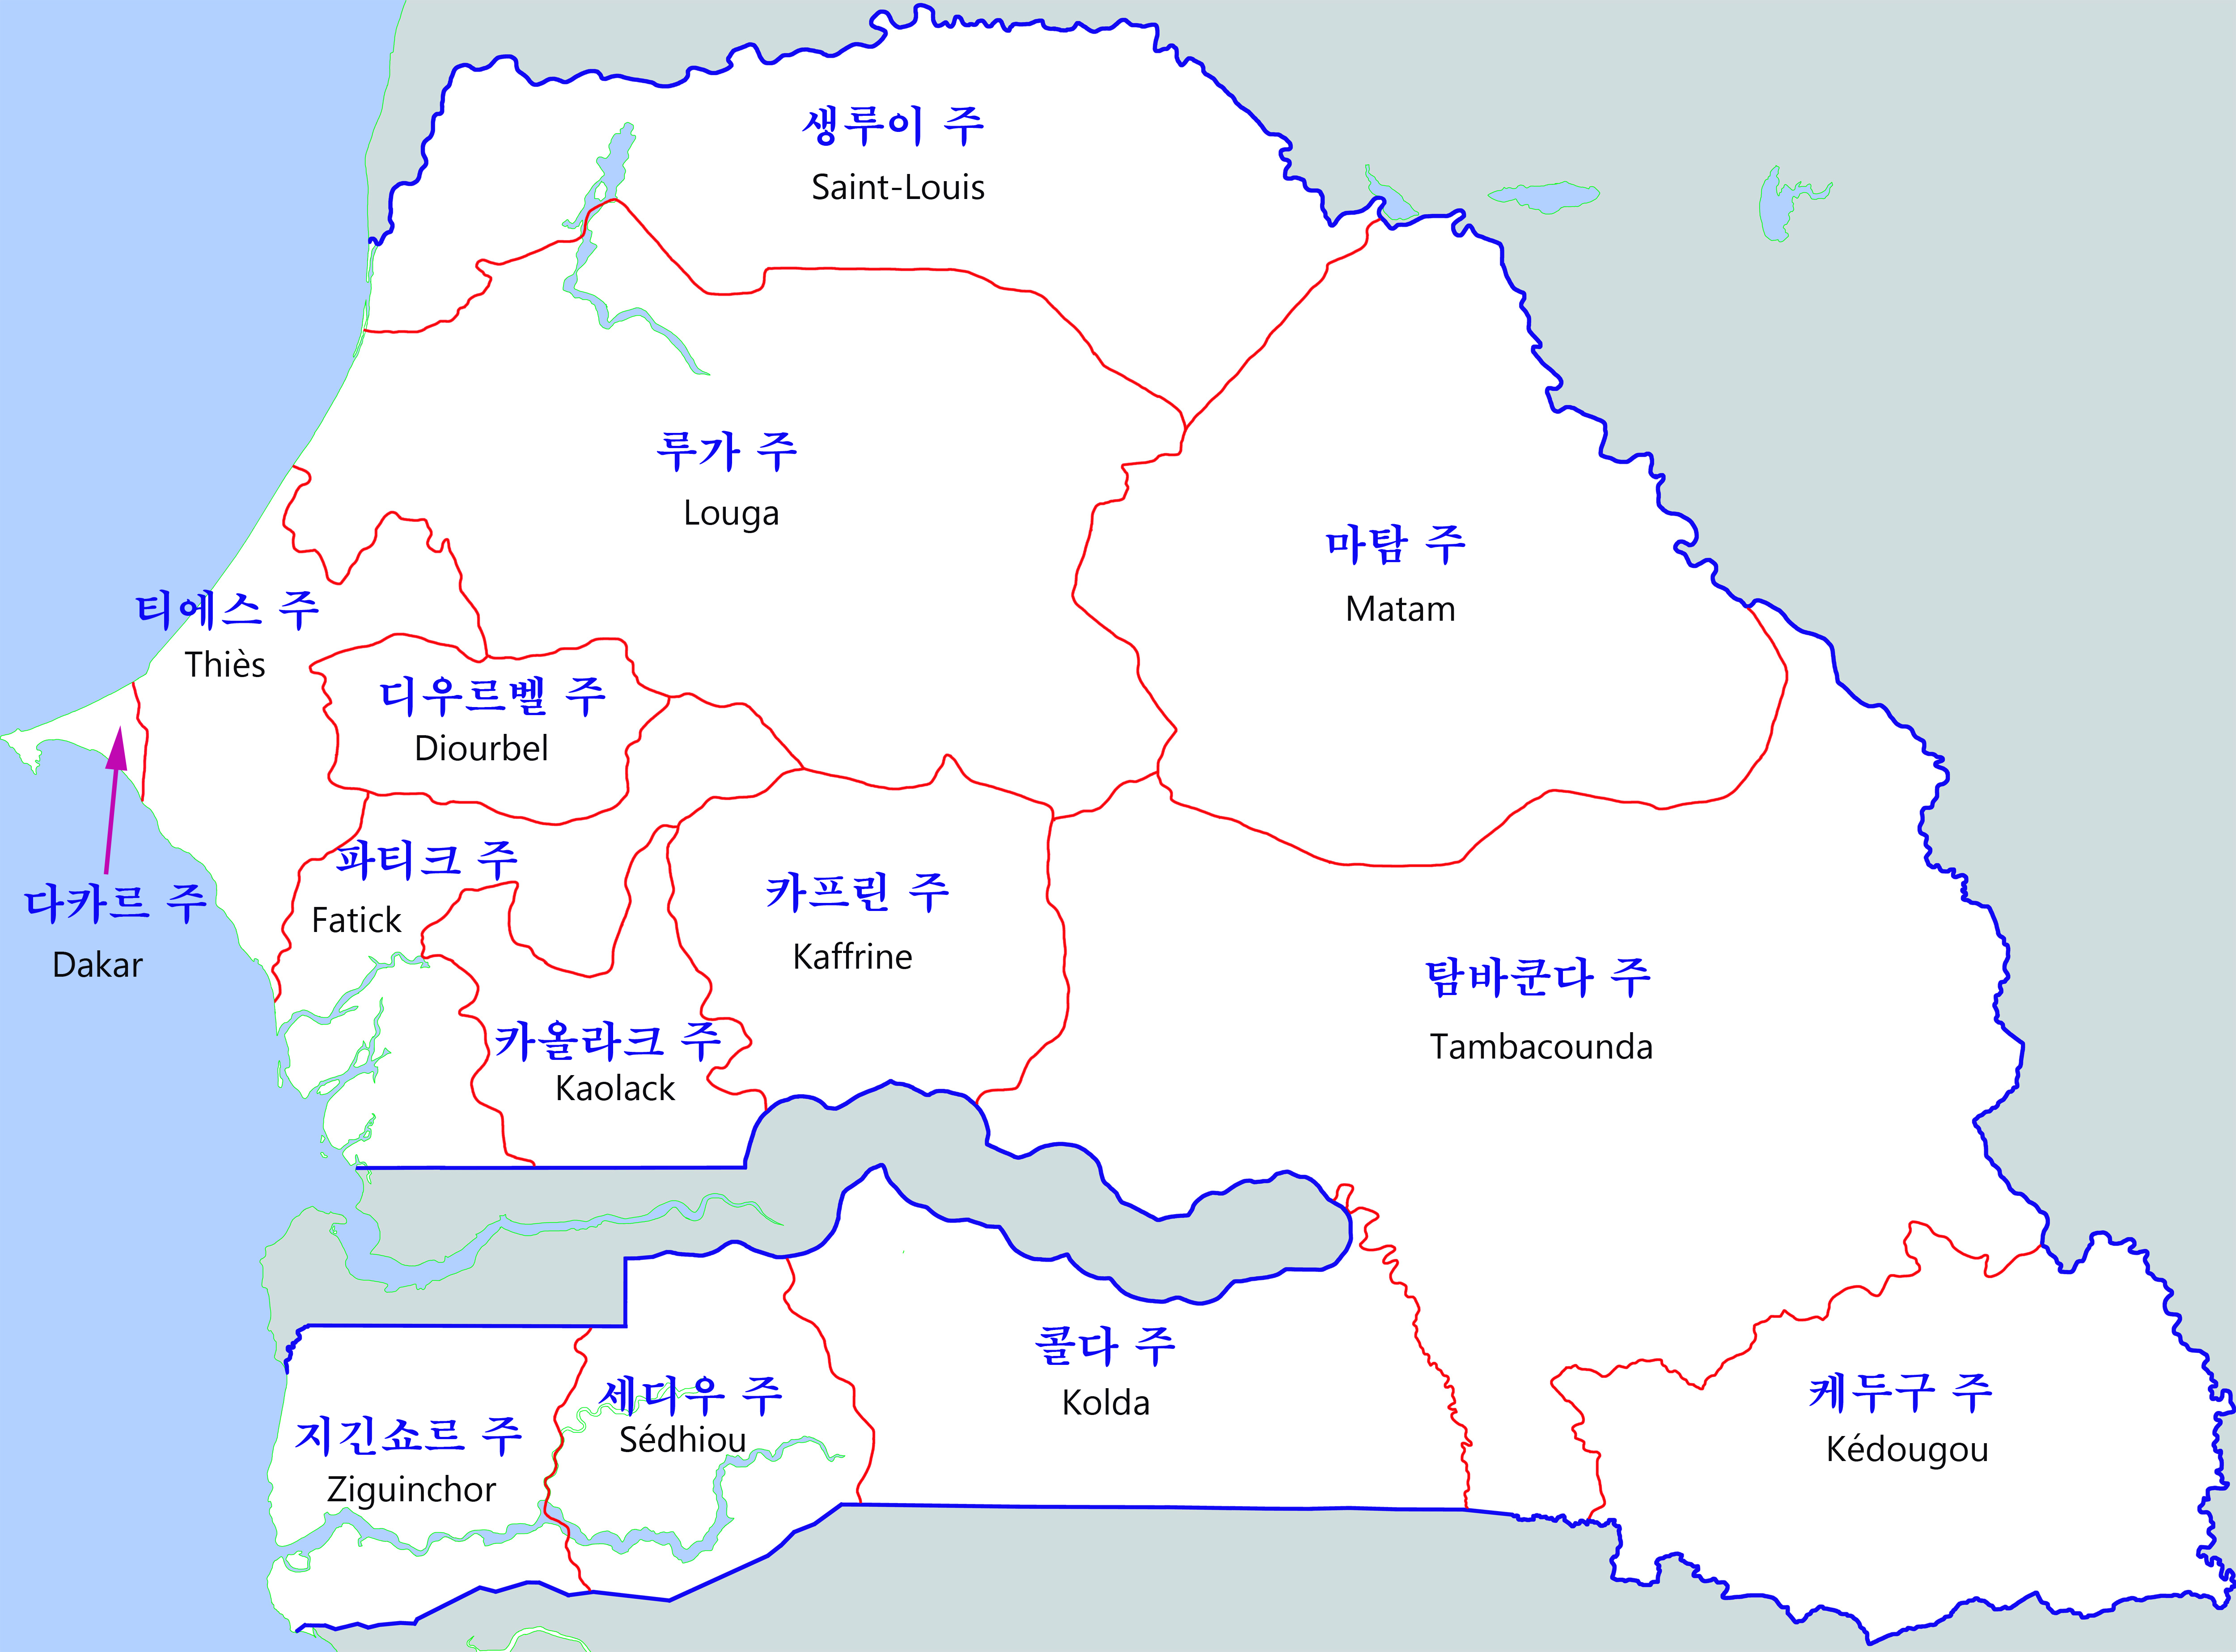 File:Senegal-map.png - Wikimedia Commons on rwanda map, bangladesh map, seychelles map, morocco map, madagascar map, the gambia map, turkey map, tunisia map, namibia map, sudan map, benin map, algeria map, cameroon map, africa map, lesotho map, eritrea map, mali map, niger map, nigeria map, gabon map, malawi map, zimbabwe map, ethiopia map, ghana map, nepal on map, singapore map, denmark map, uganda map, dakar map, syria map, angola map, political map, guinea map, kenya map, mozambique map, tanzania map,